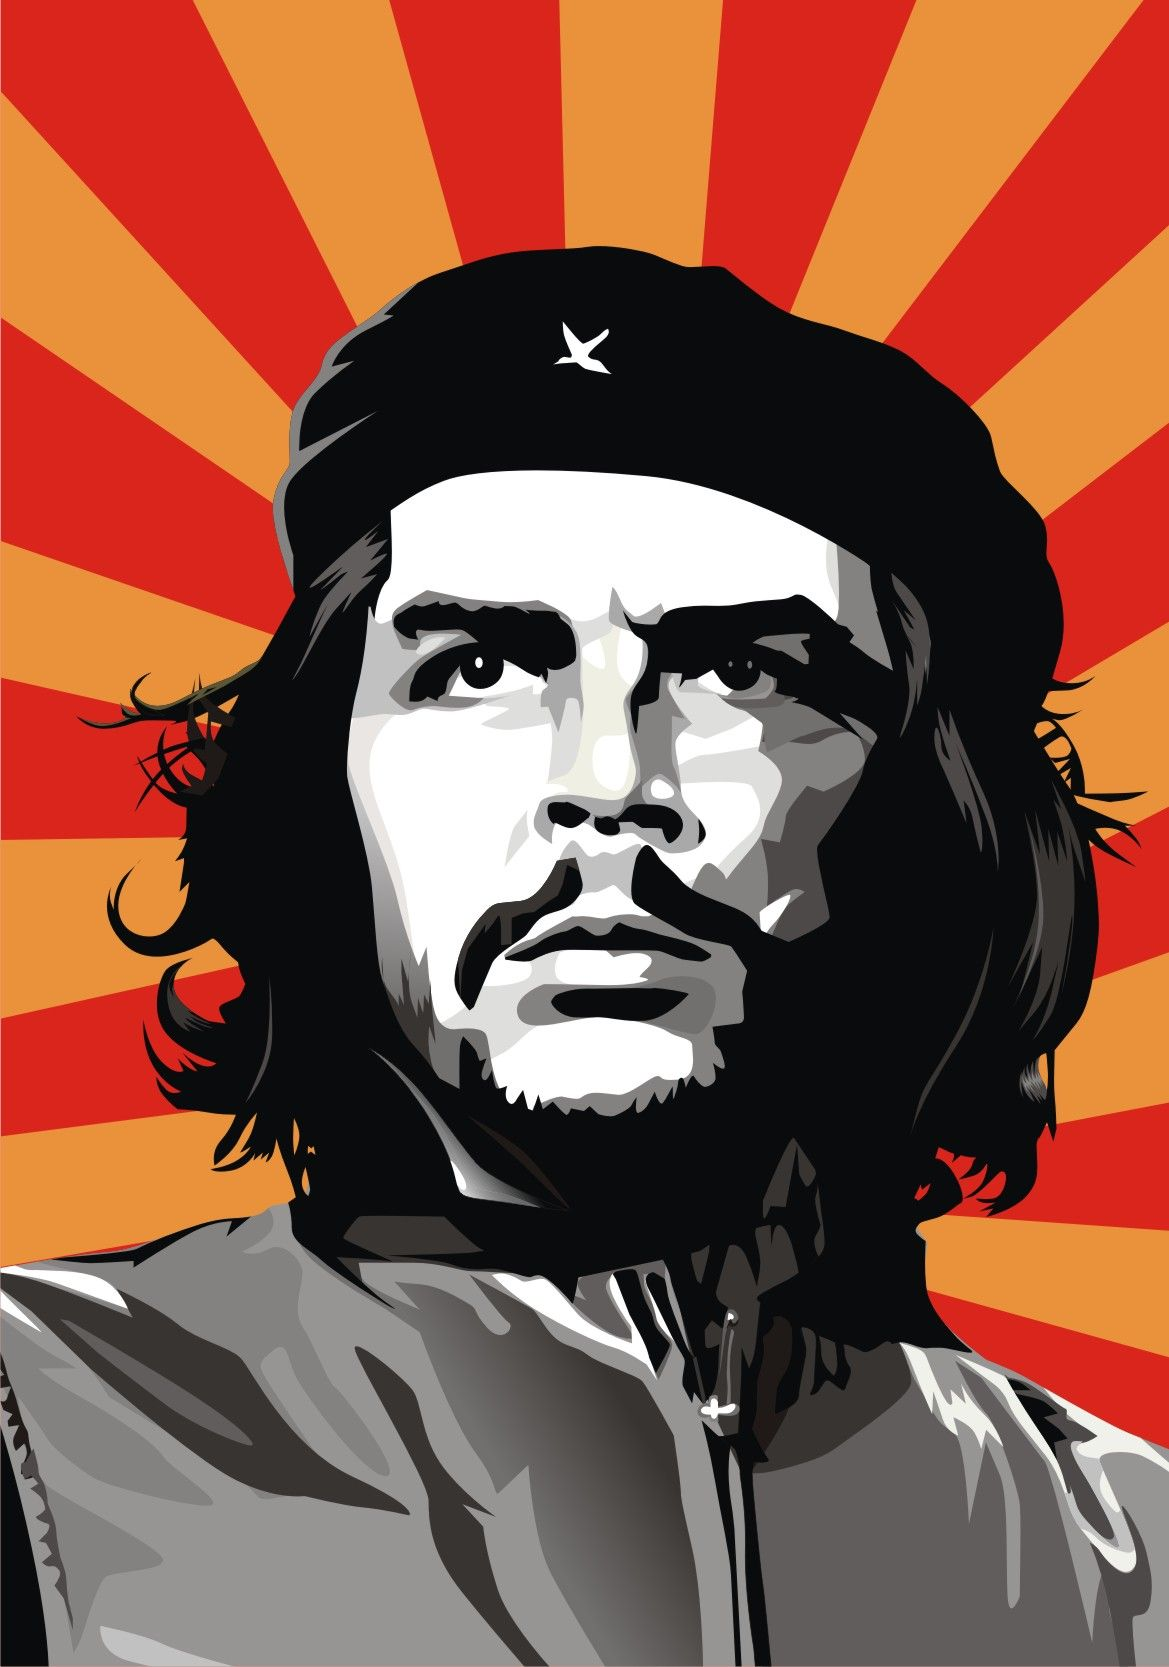 Che Guevara | Pop art, Che guevara, Ritratti